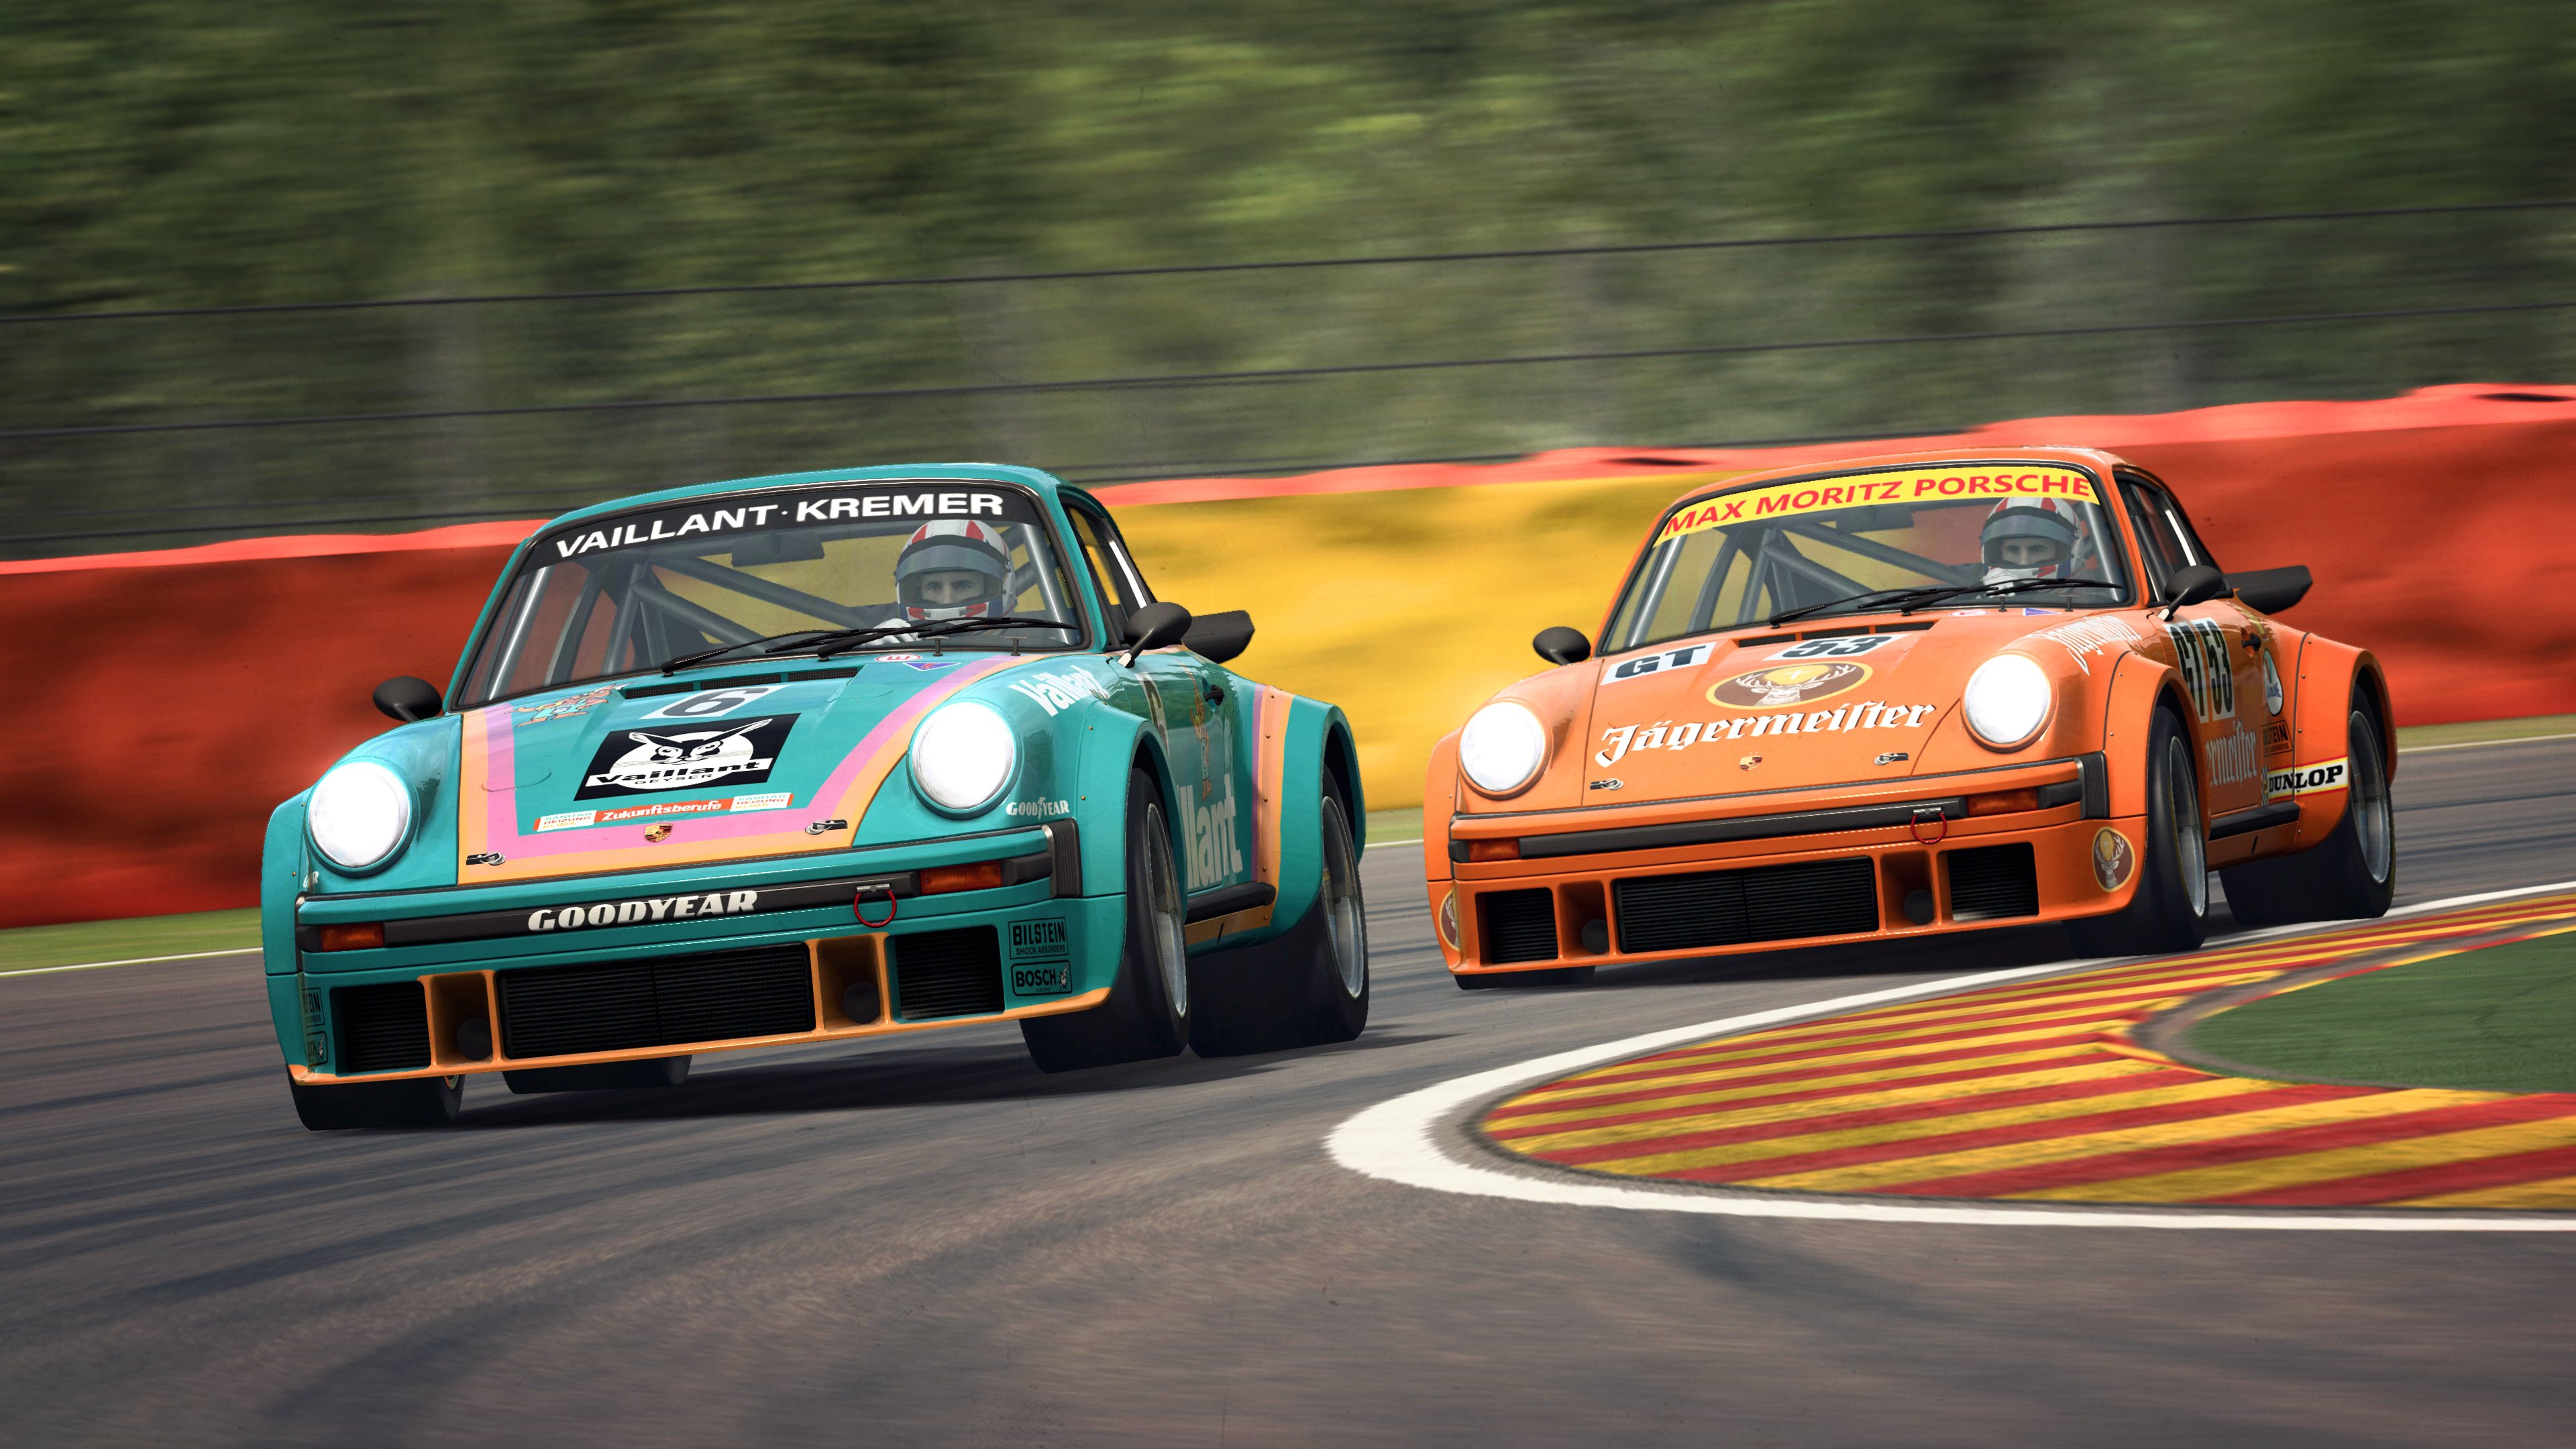 RaceRoom Porsche 934 RSR (Group 4) 3